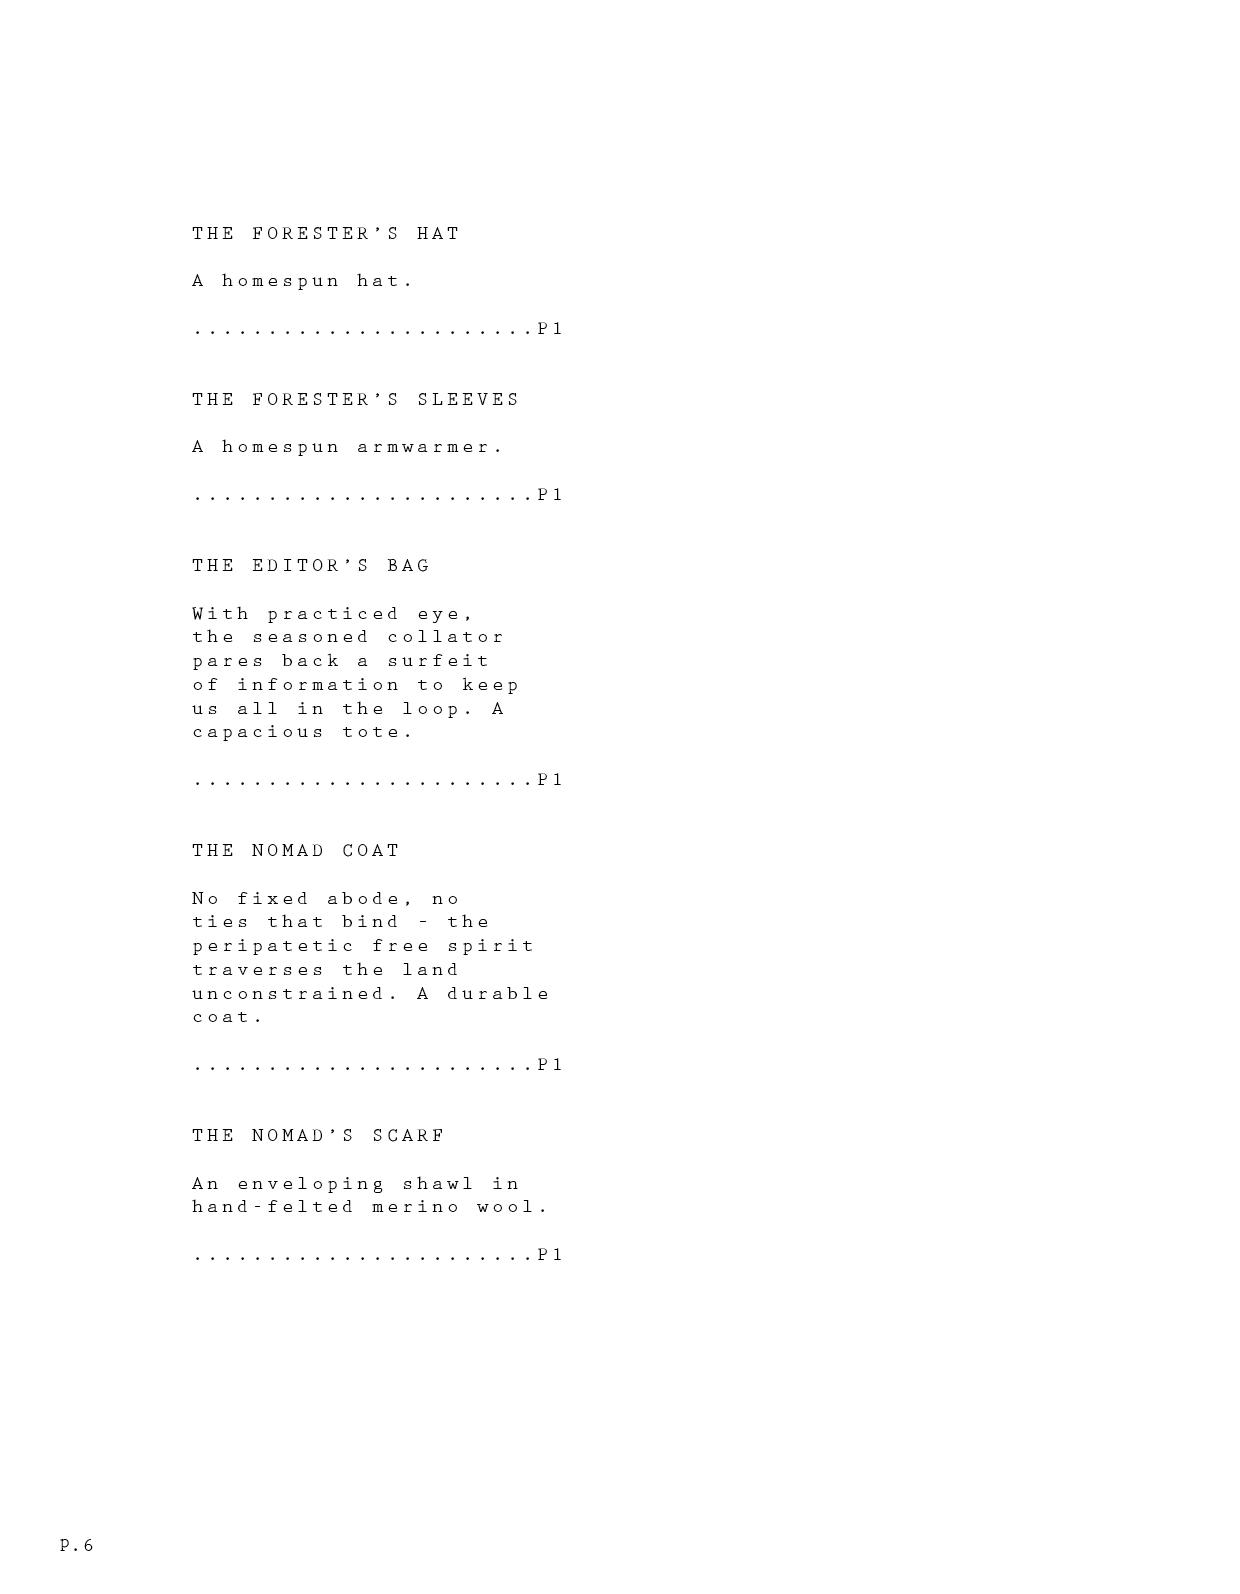 003_Toogood_The book_150216_lowres6.jpg